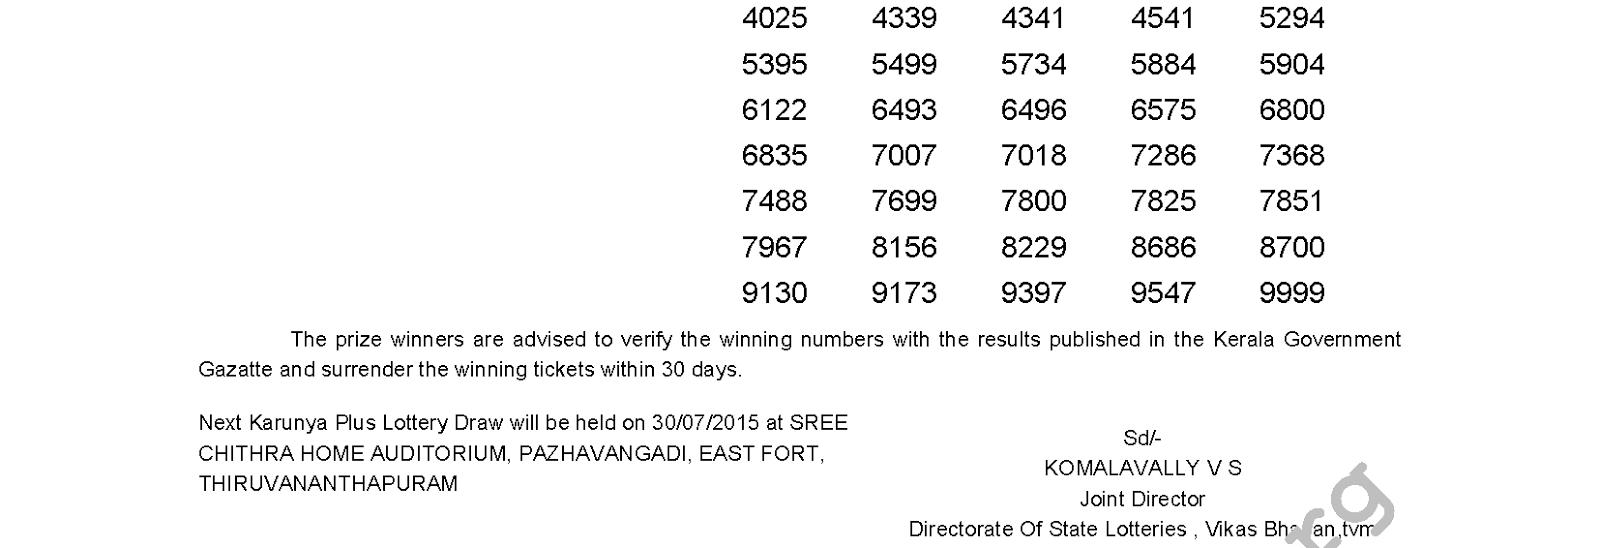 Karunya Plus Lottery KN 67 Result 23-7-2015